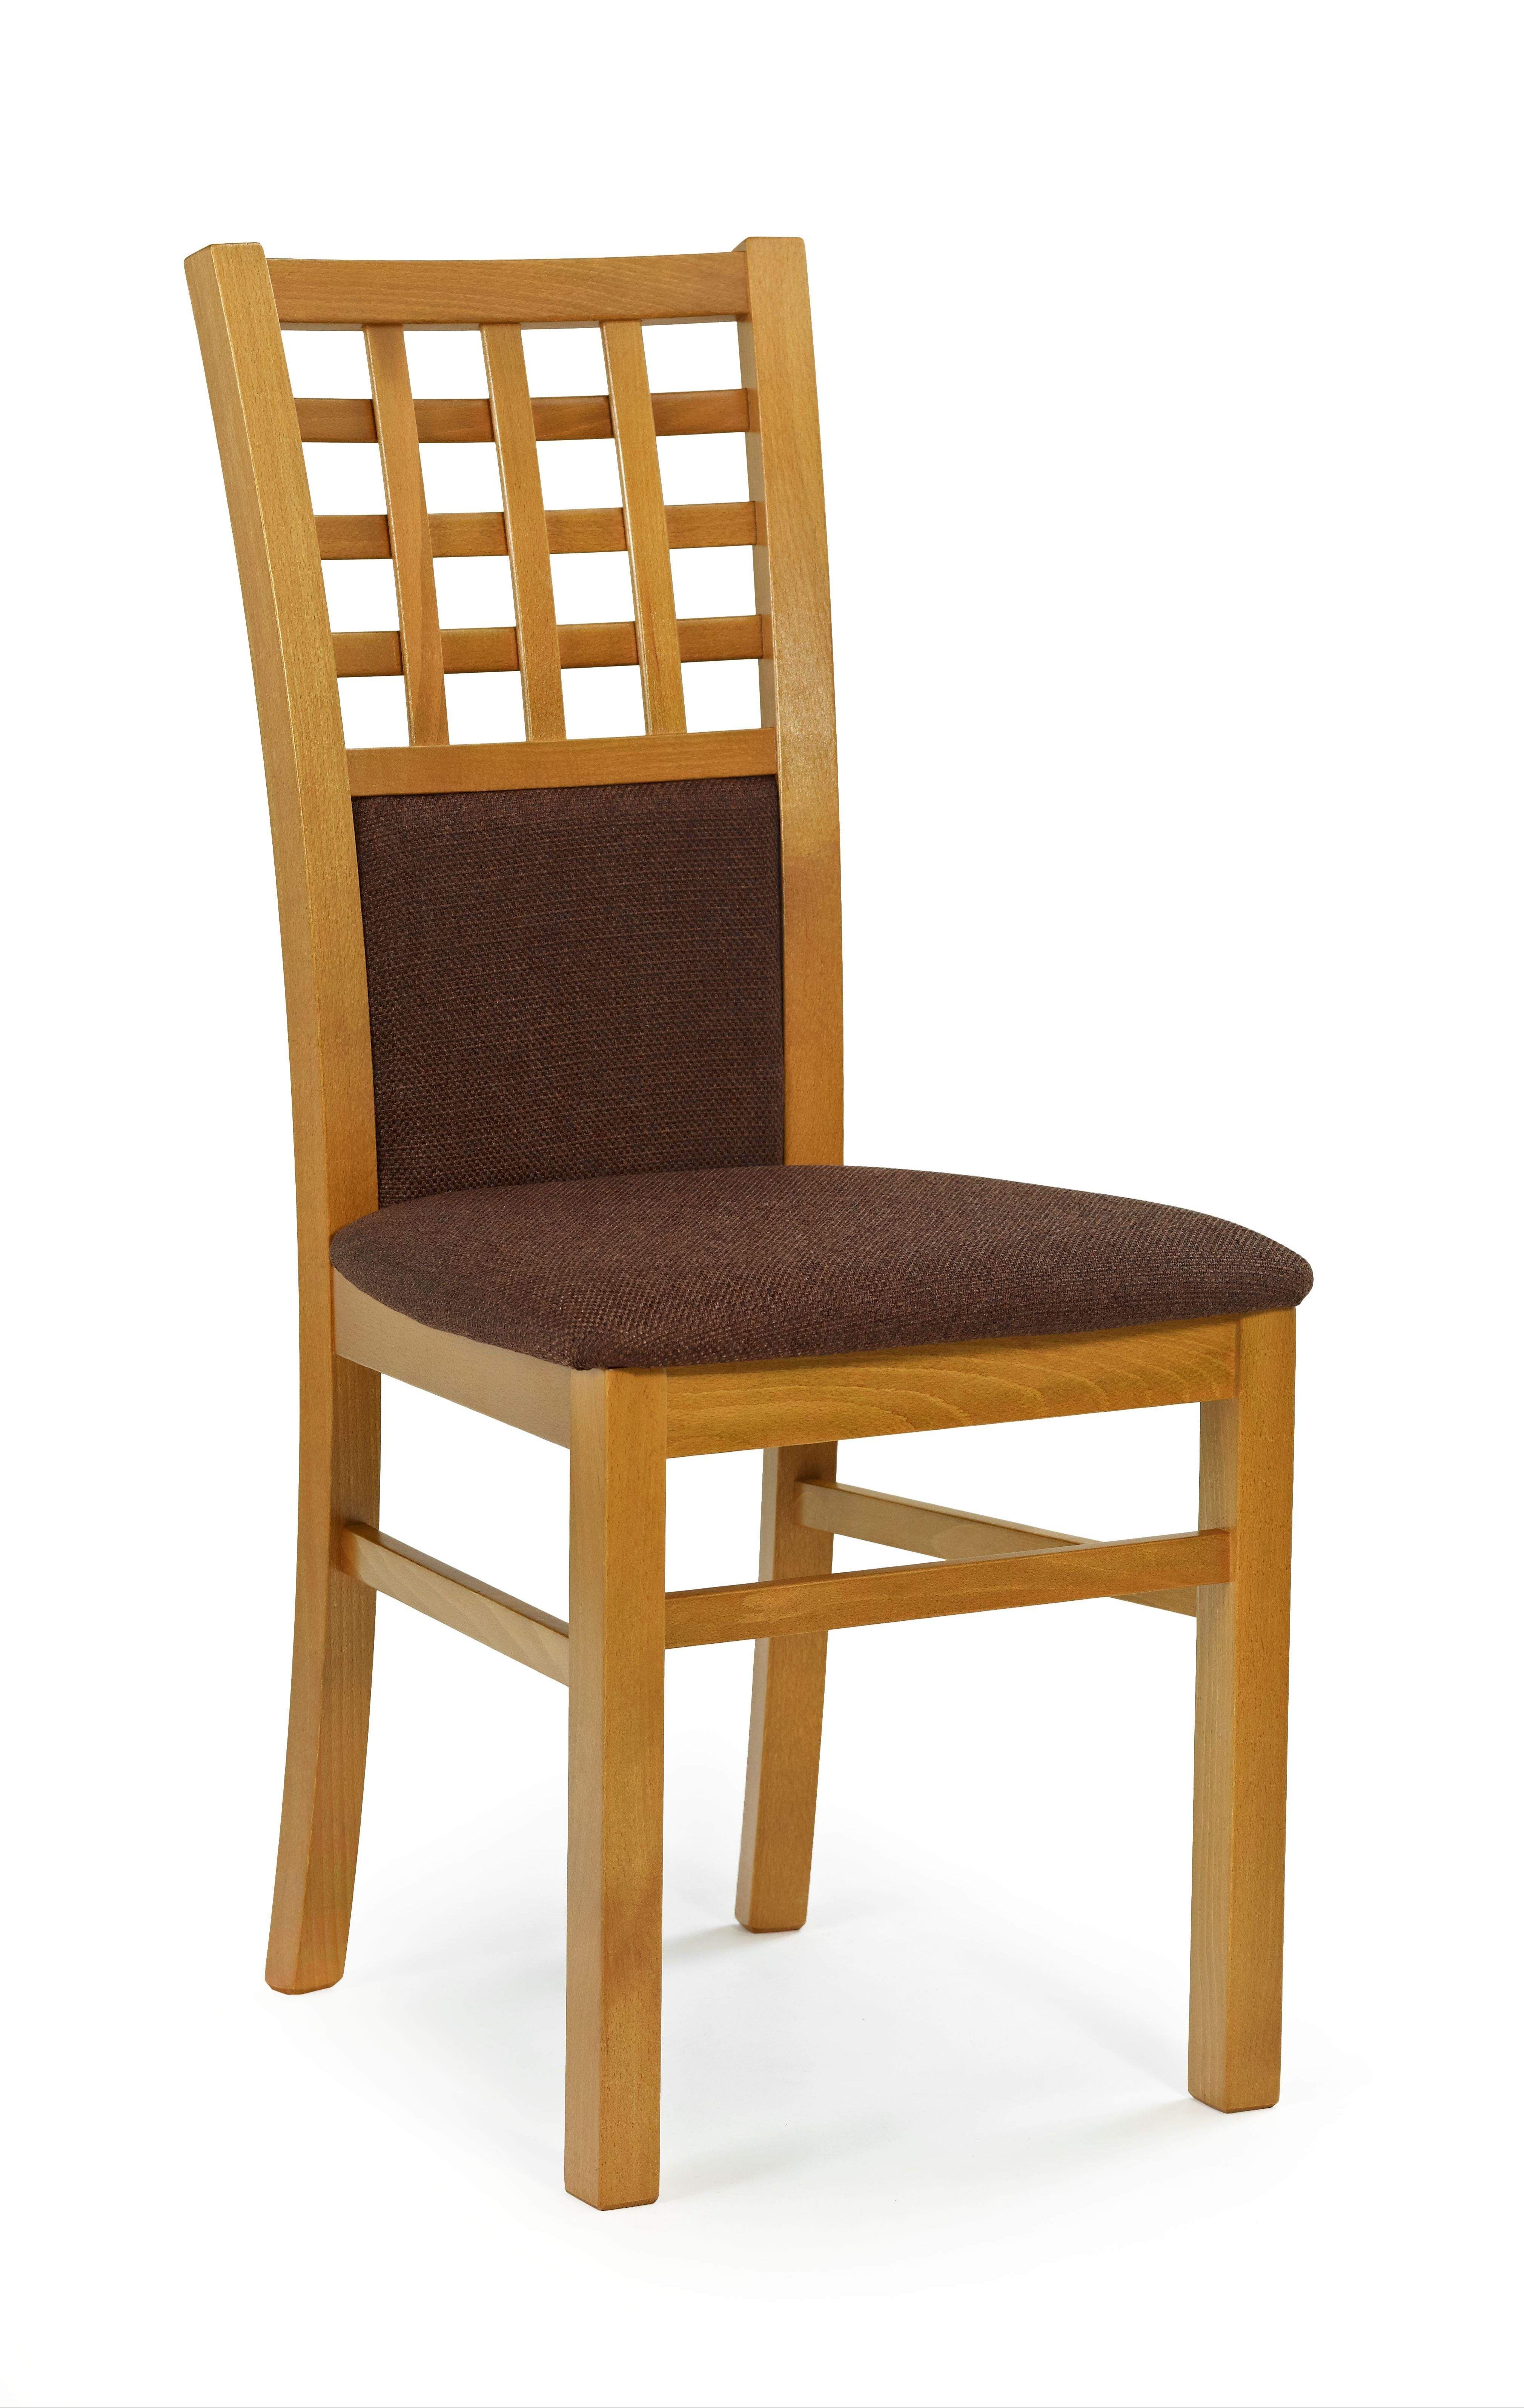 Kėdė GERARD 3 alksnis